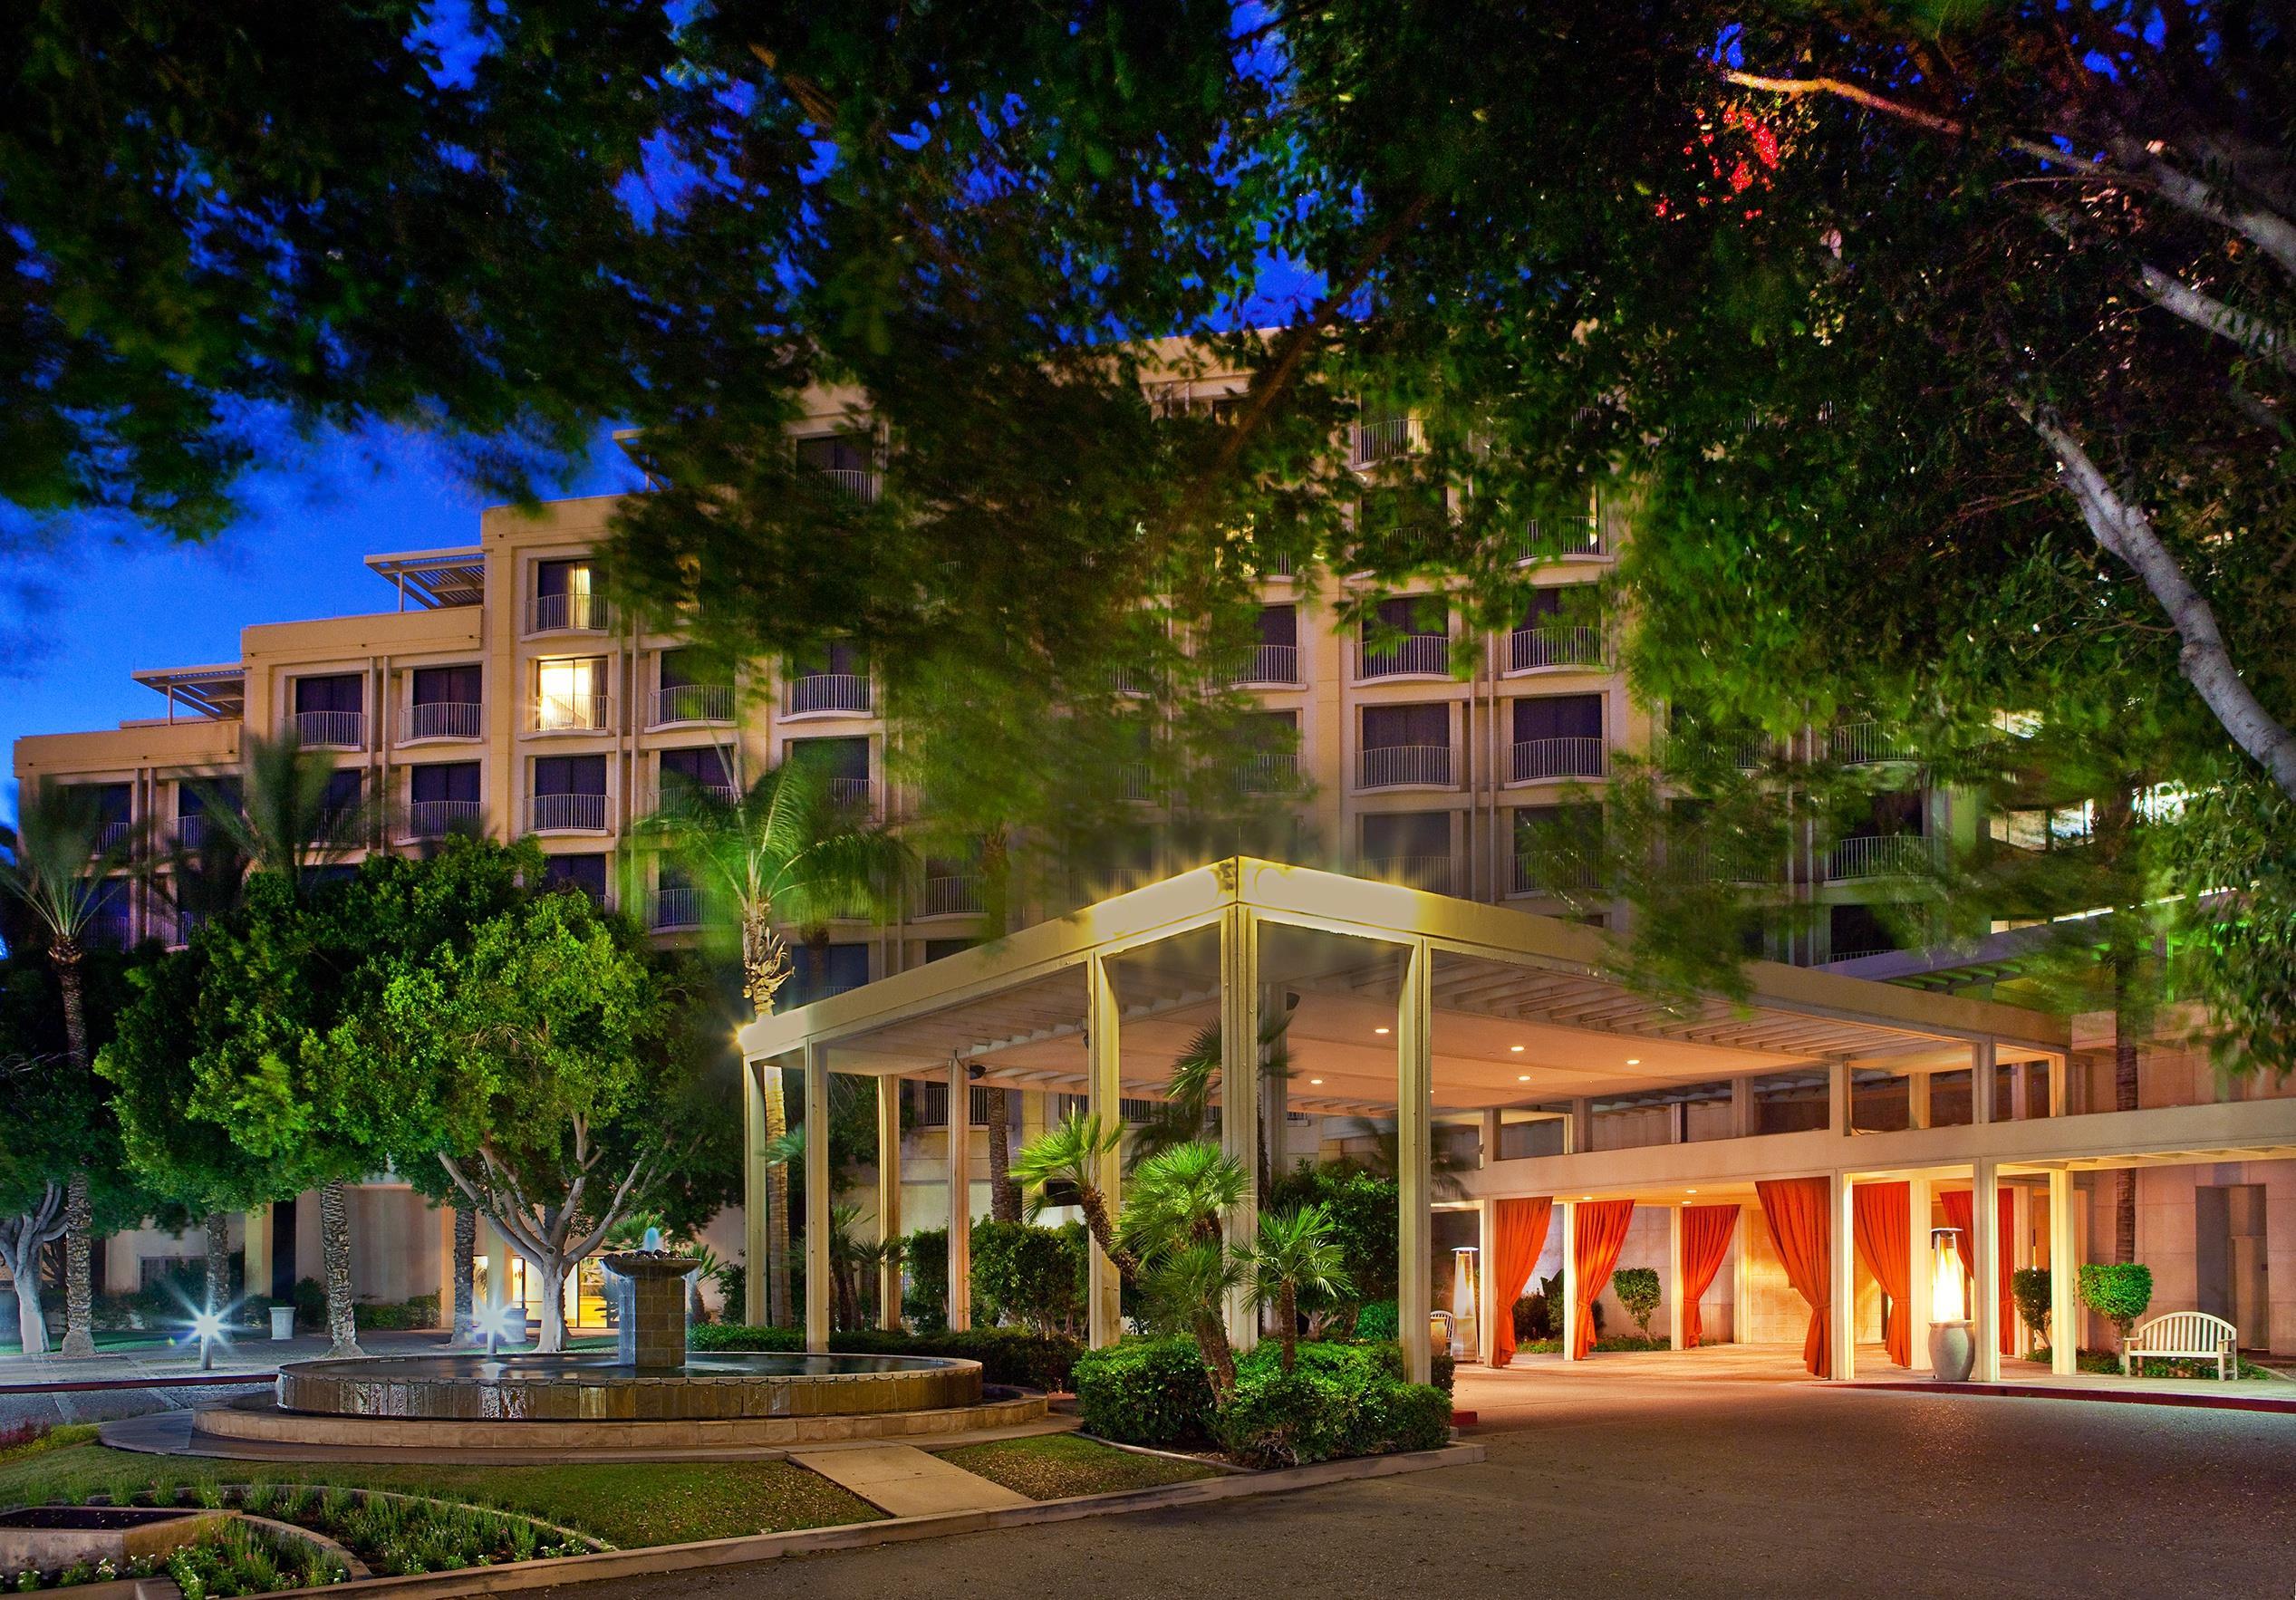 Sheraton Crescent Hotel image 6